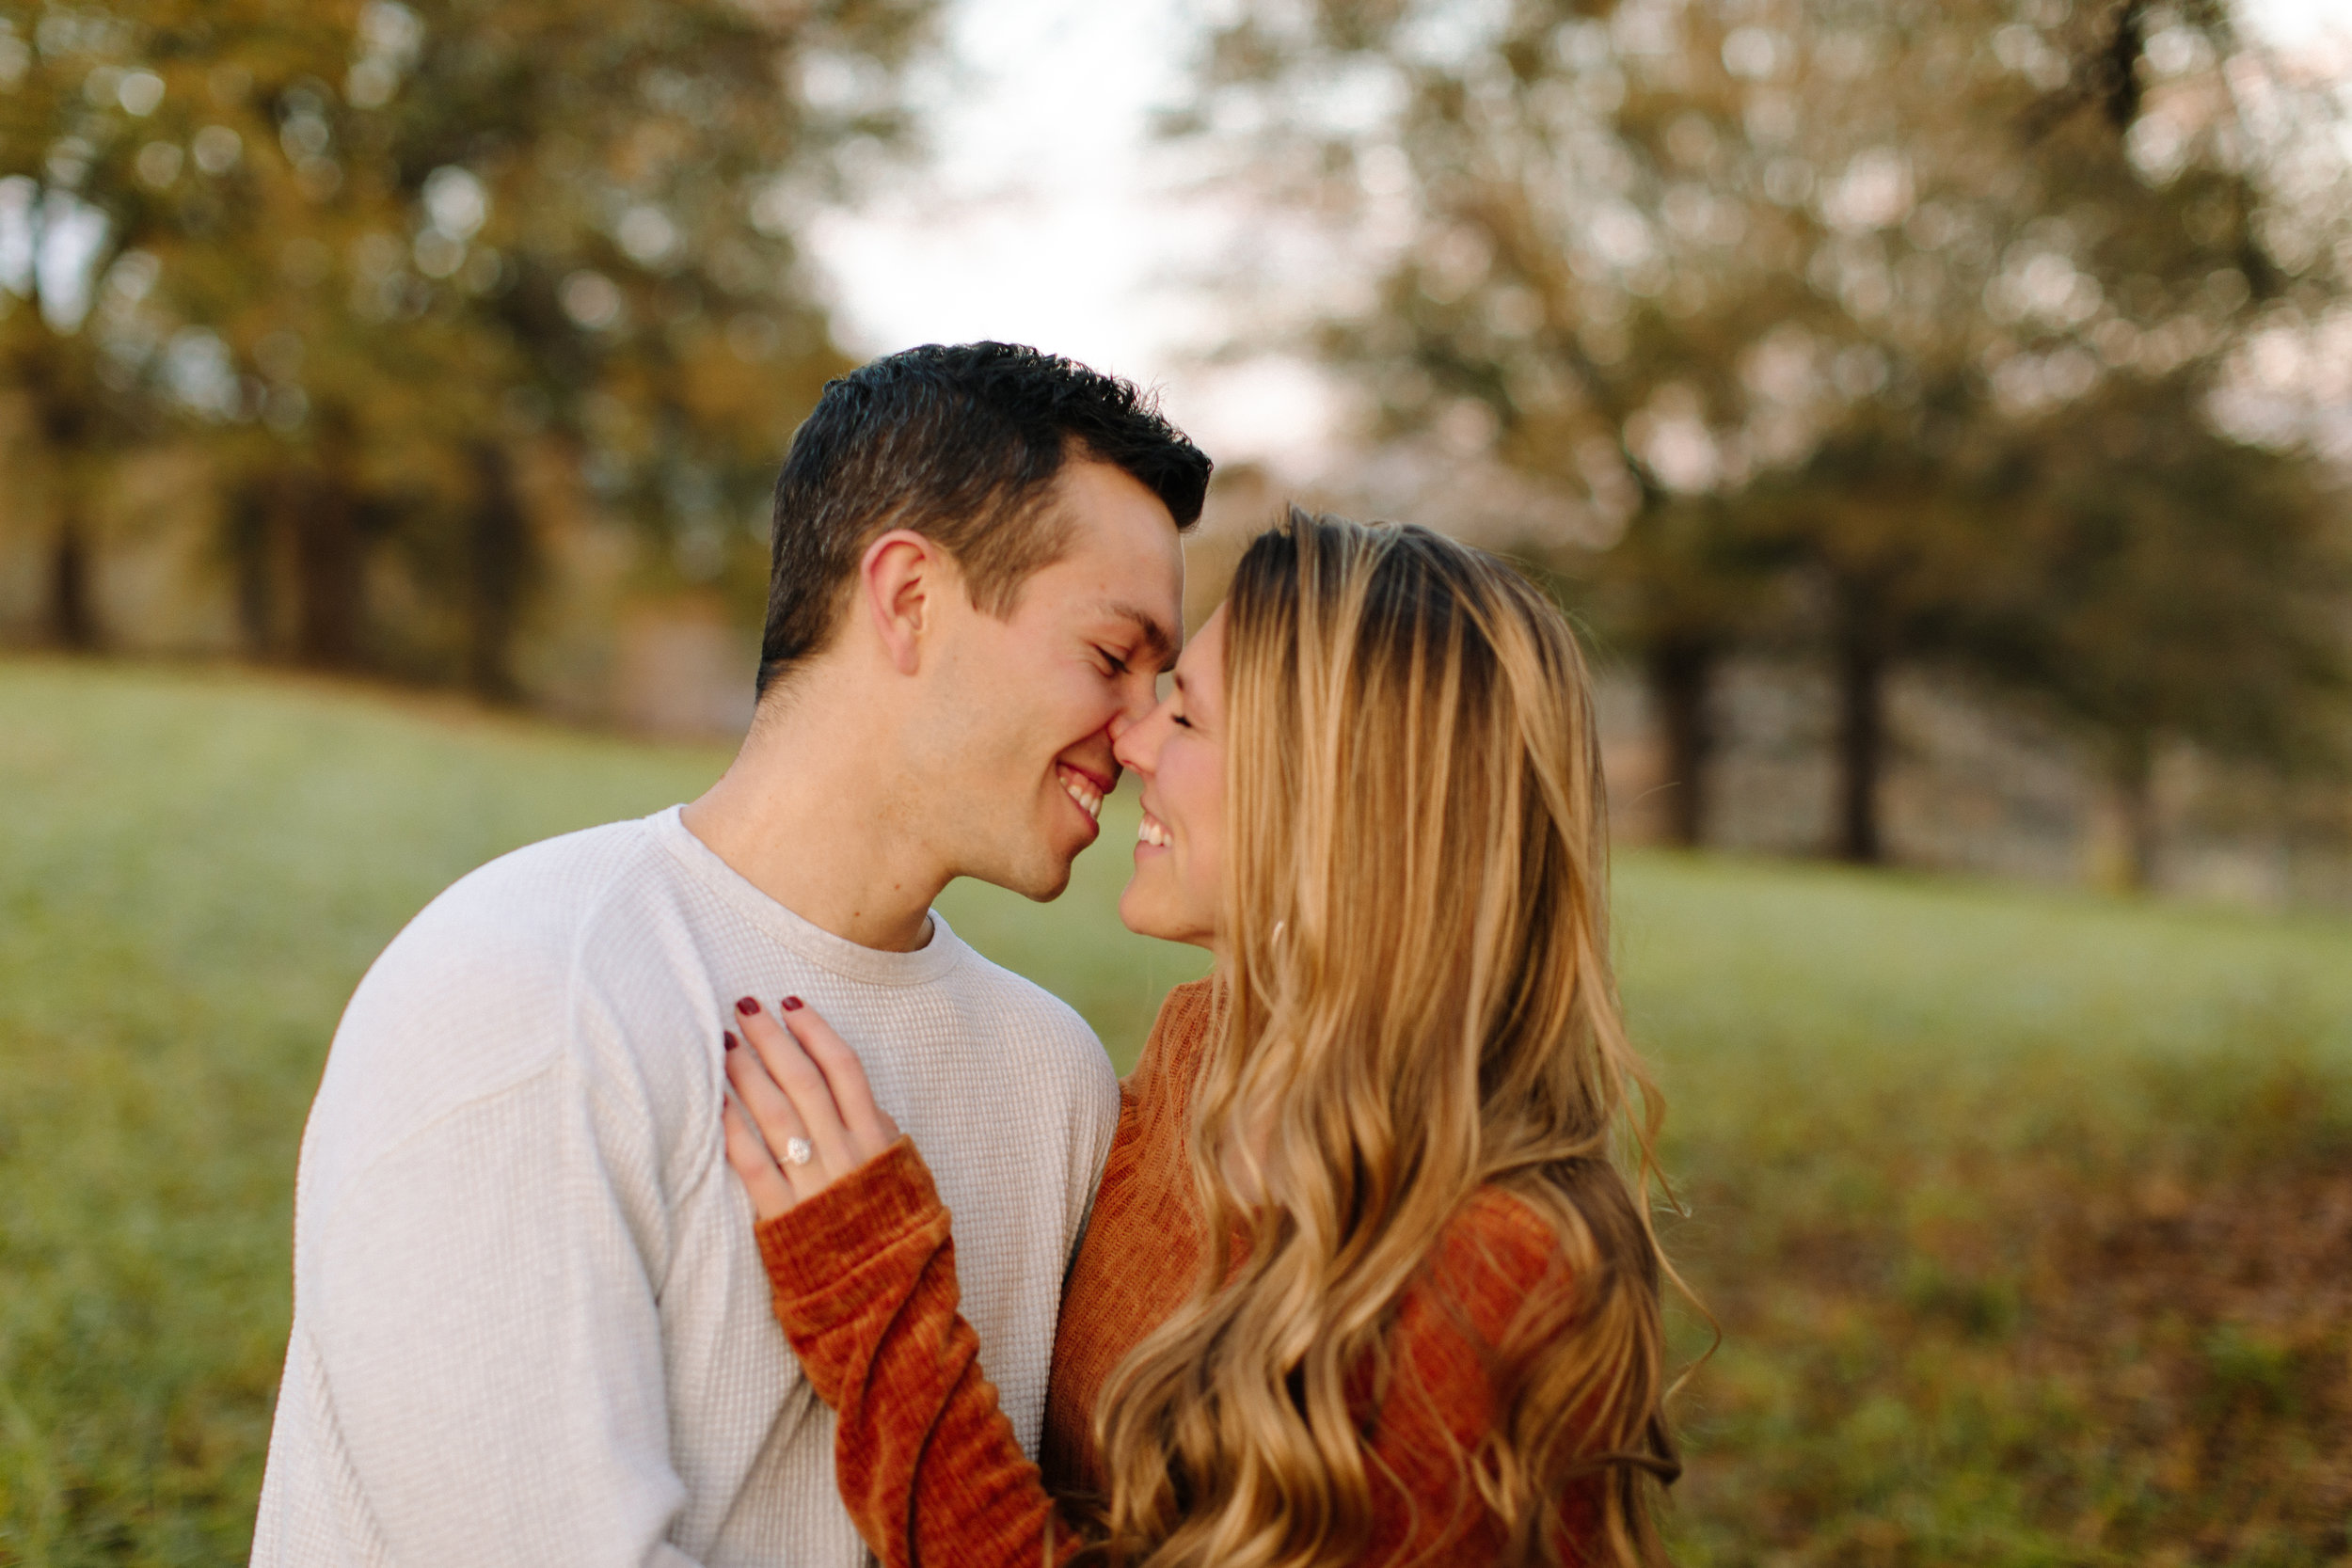 sunset-field-outdoor-romantic-engagement